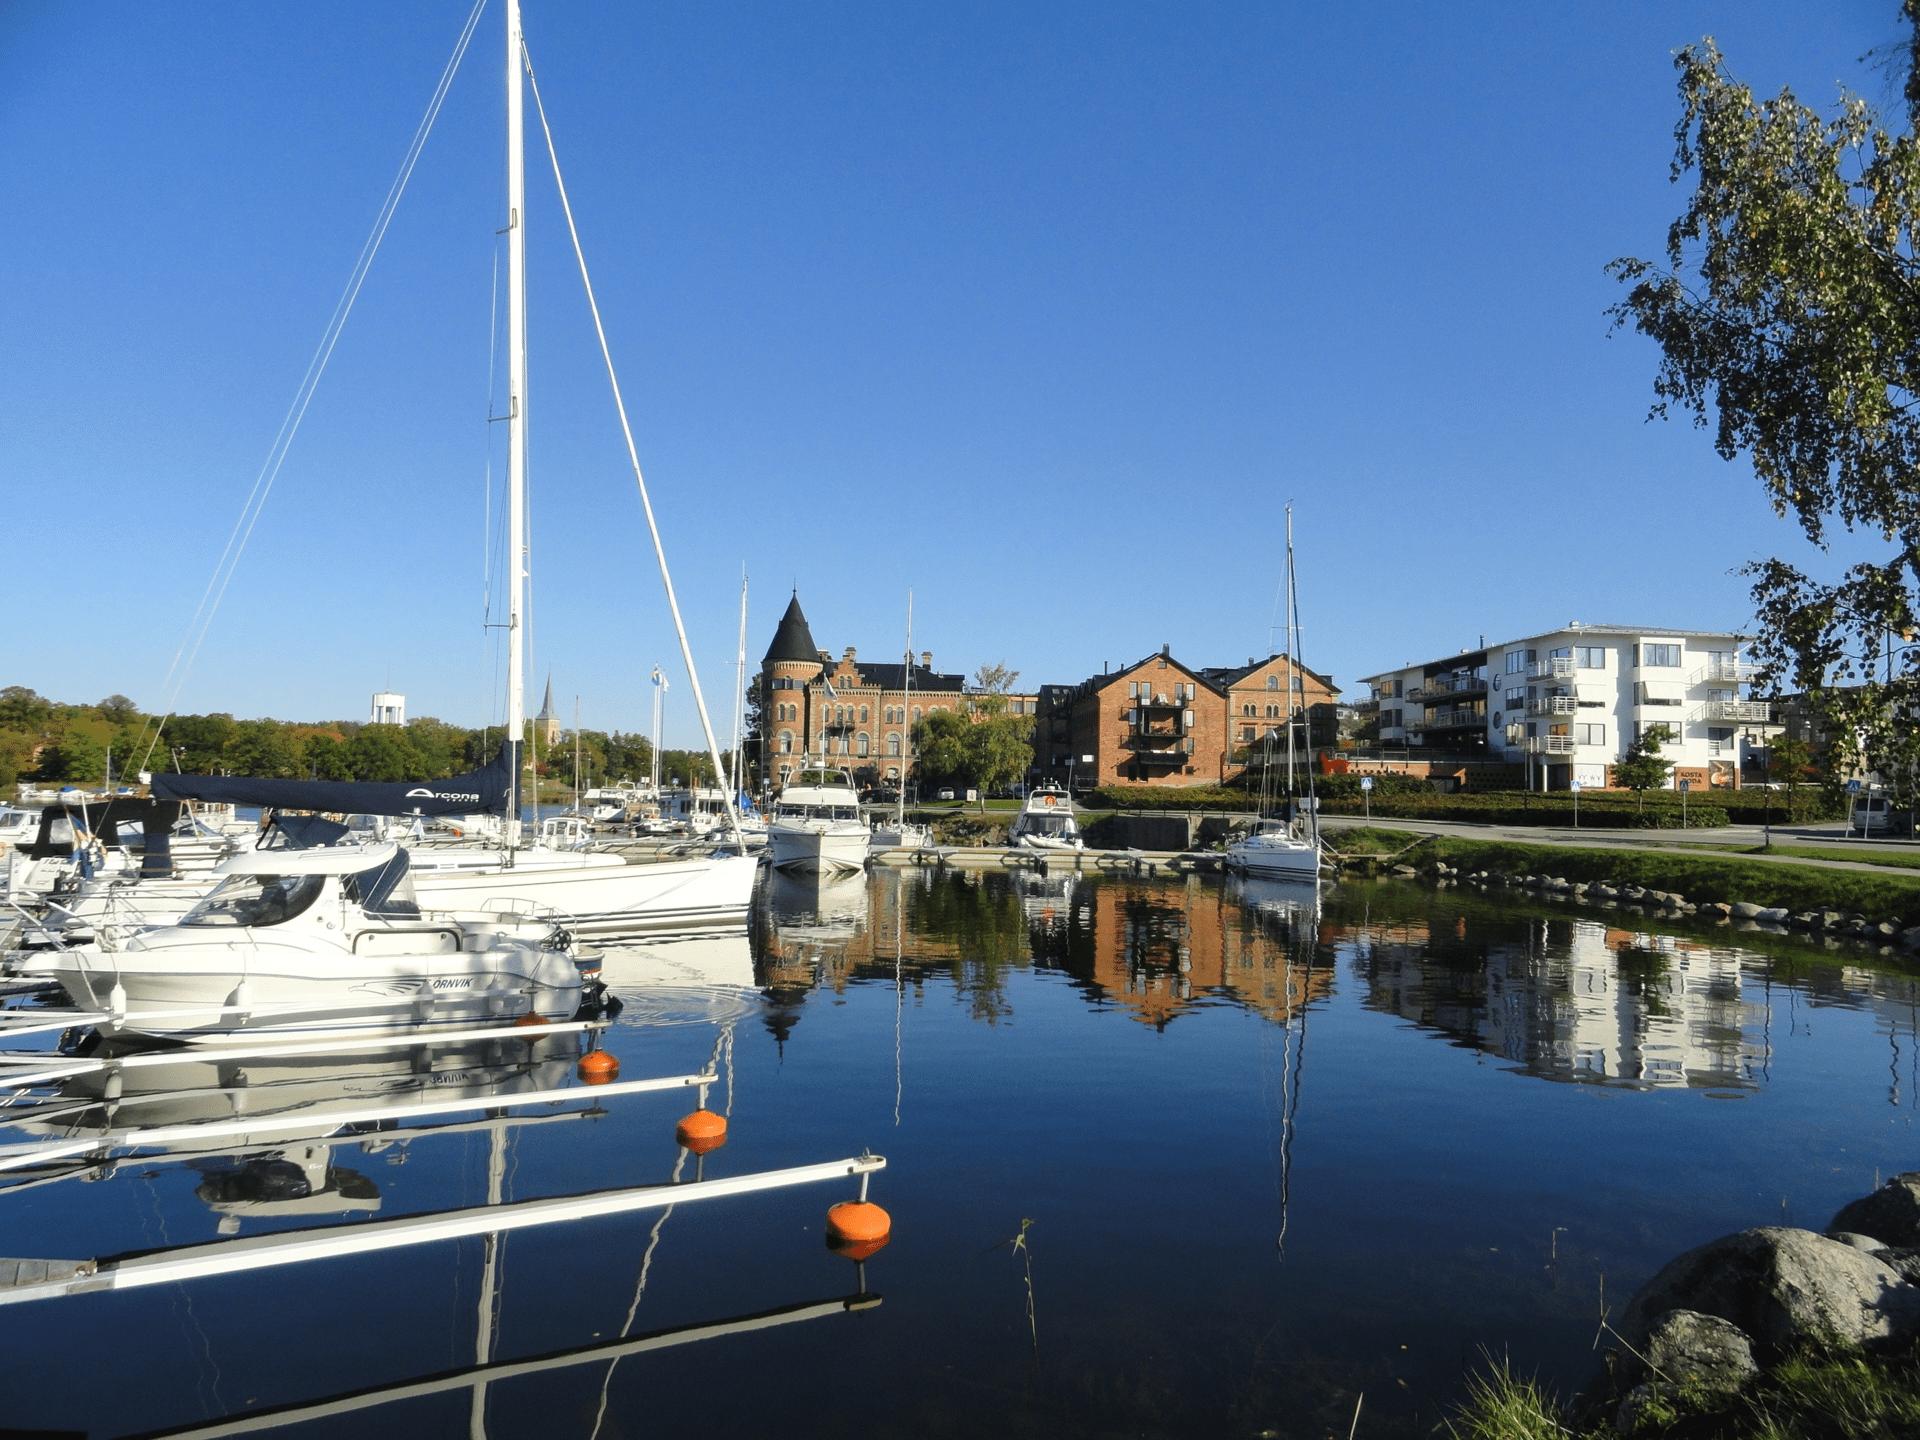 gustavsbergs gästhamn